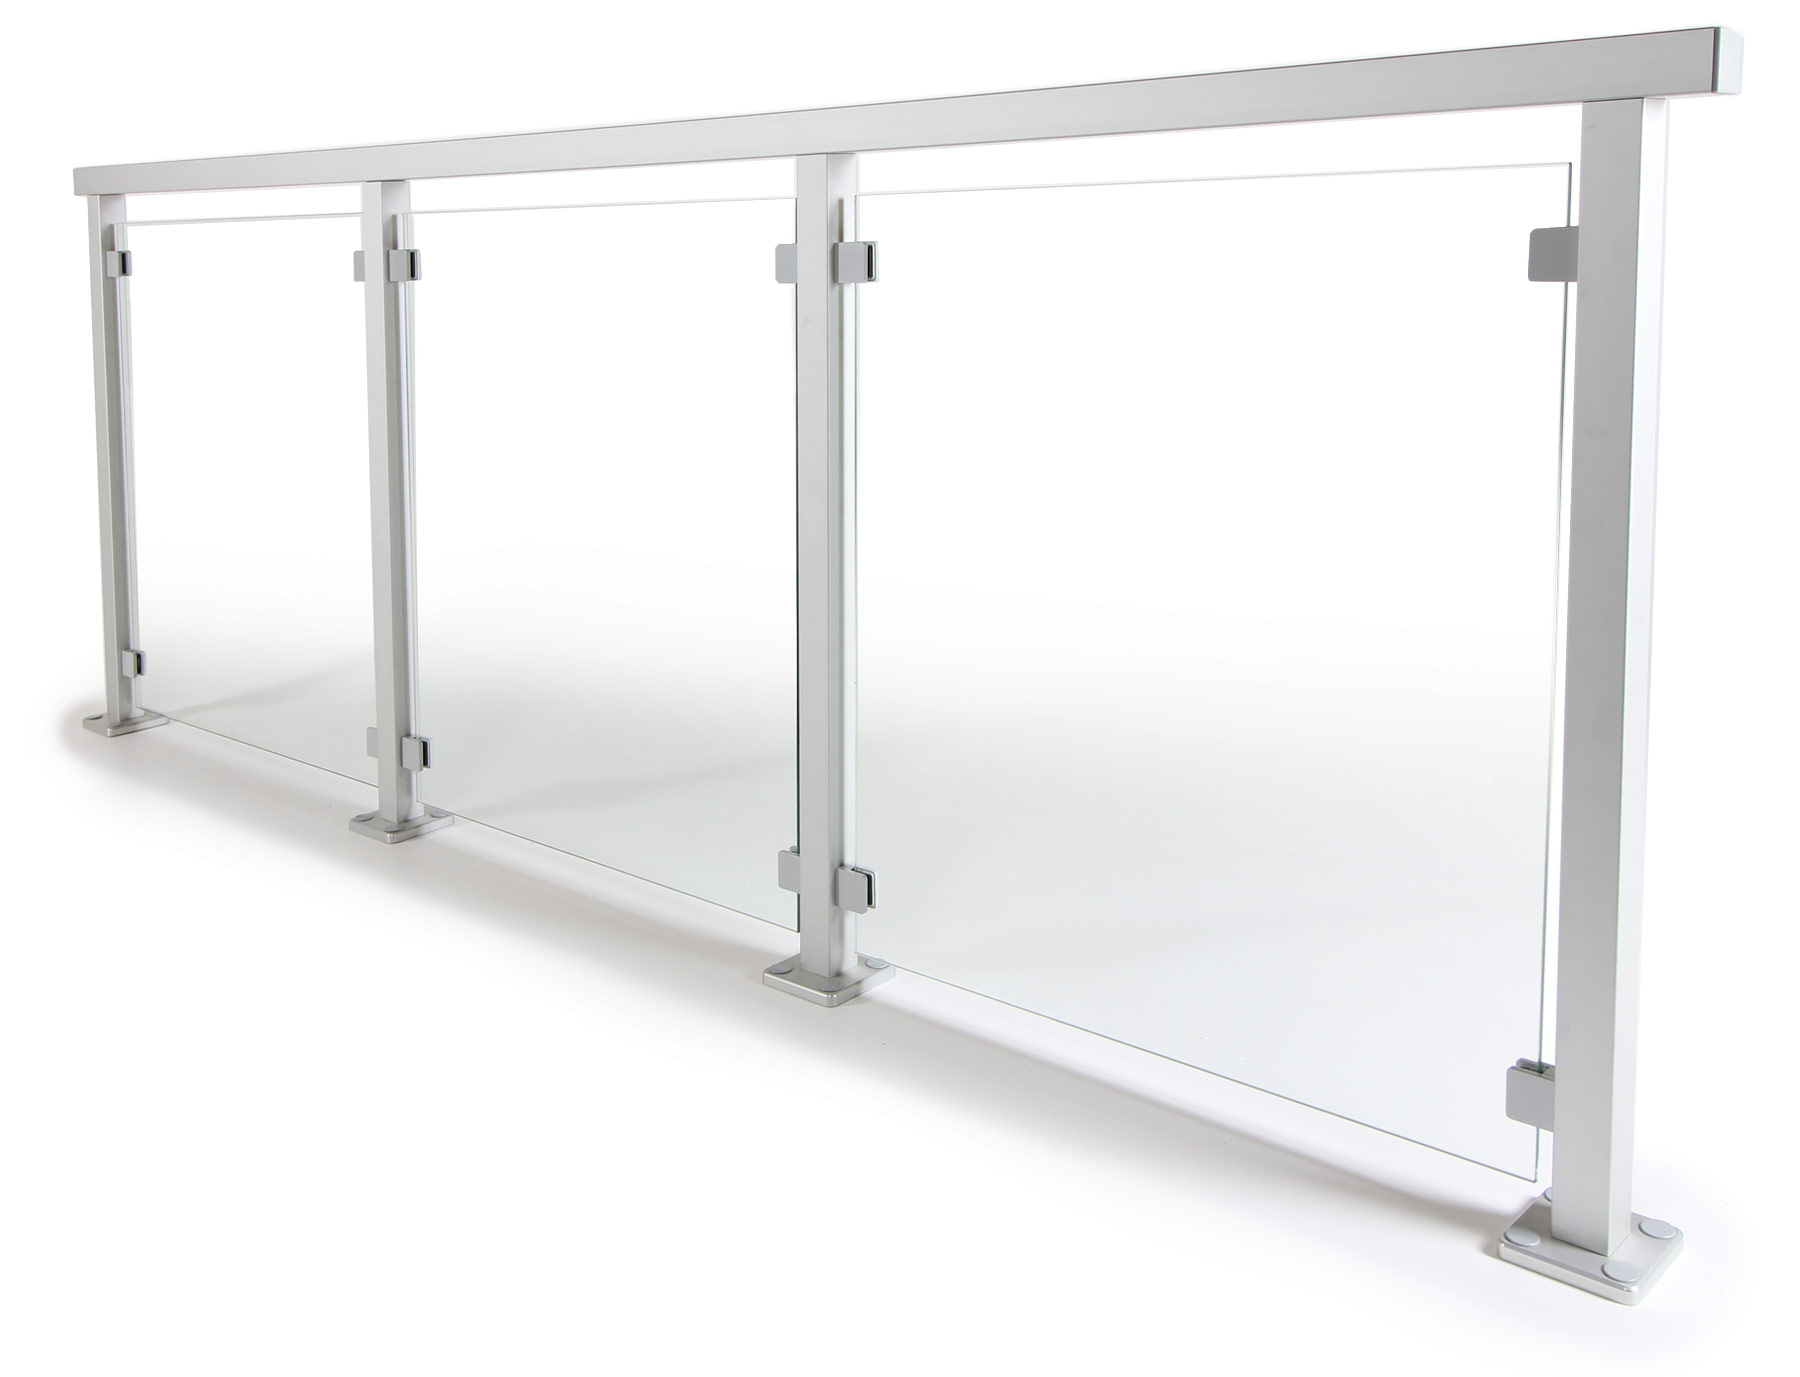 Bevorzugt Aluminiumgeländer nach Maß online bestellen   Geländerladen.de MU34